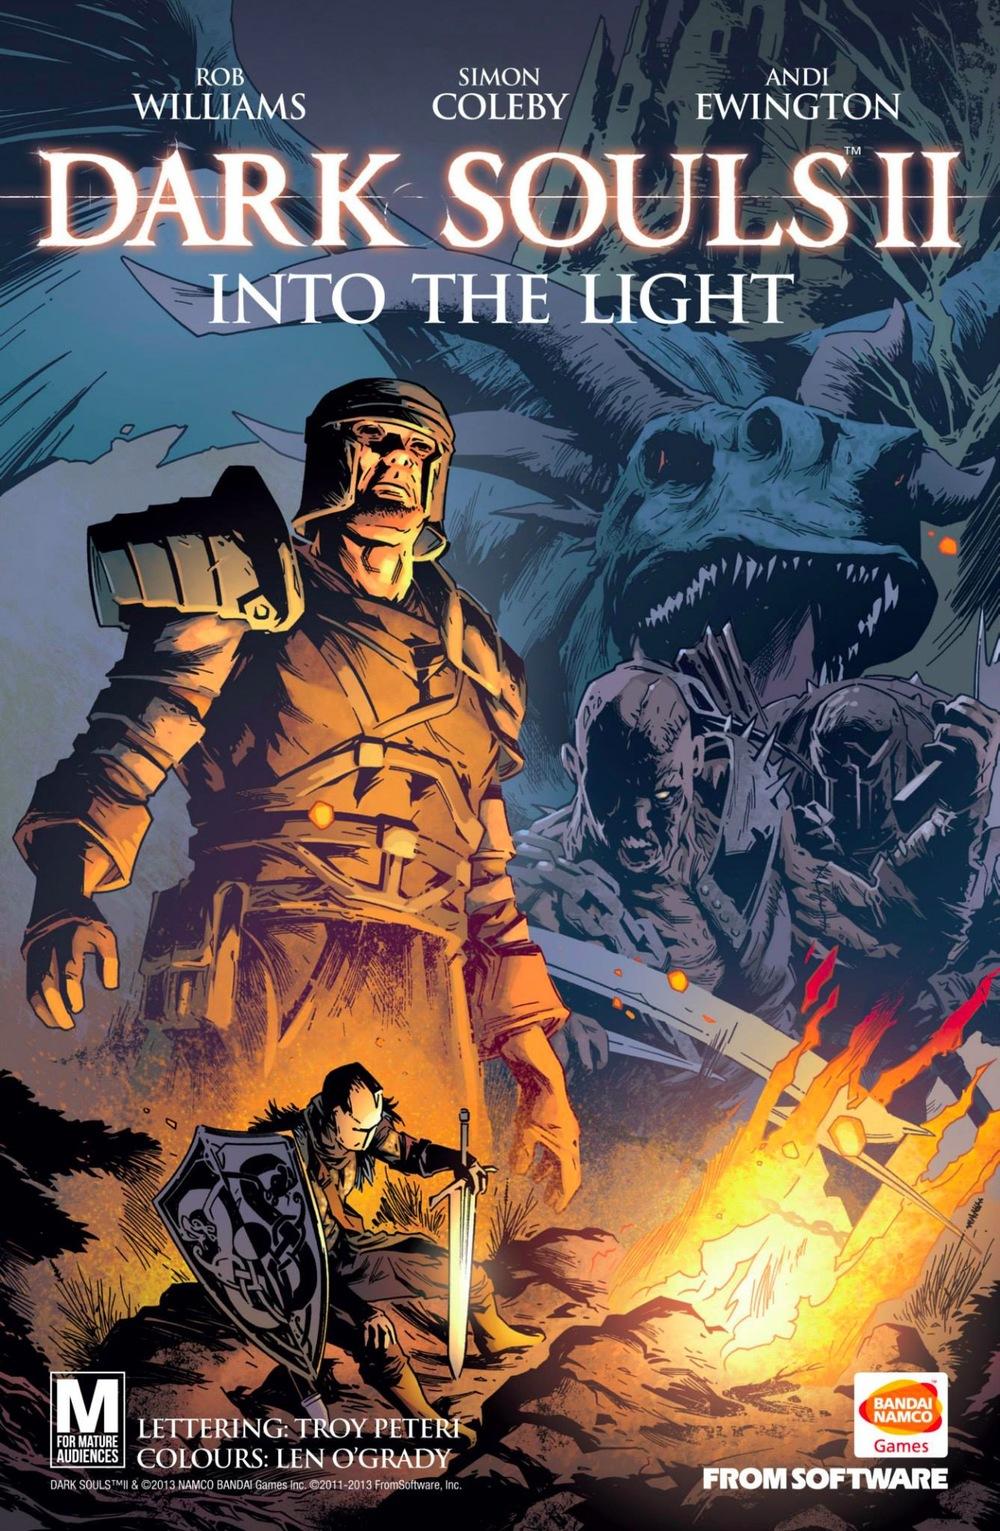 dark-souls-2-into-light-comic-cover.jpg